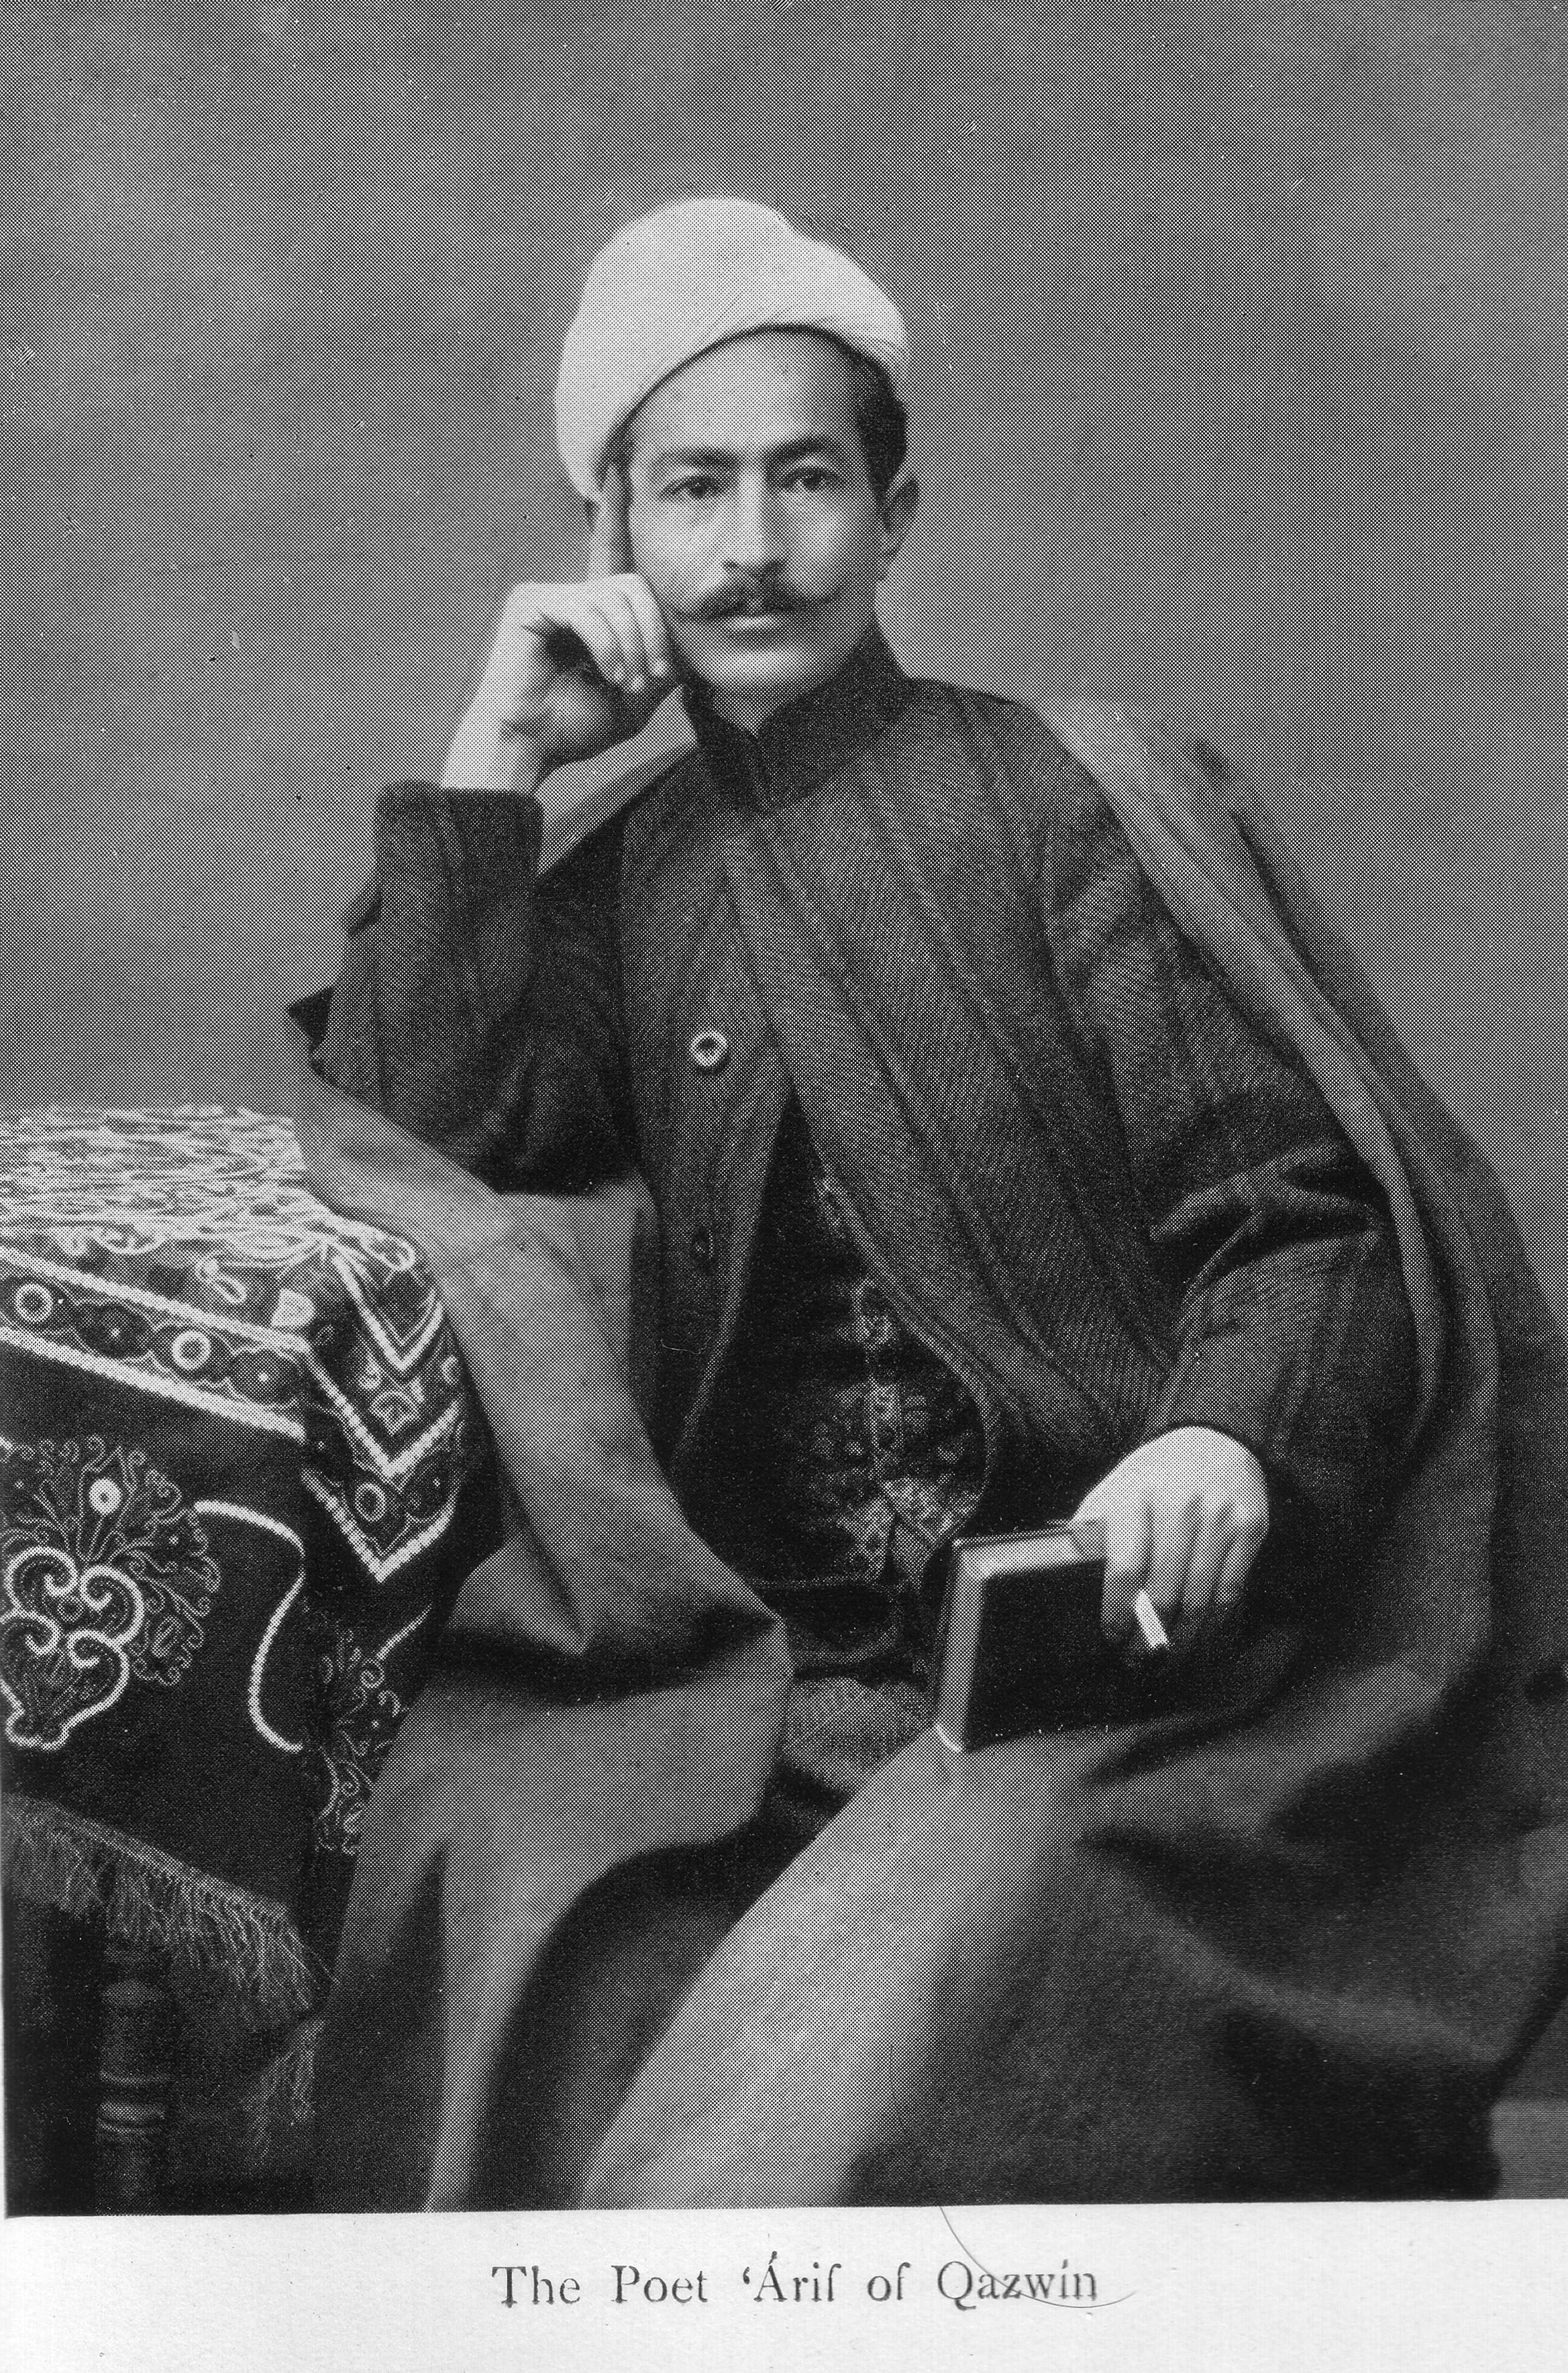 Aref Ghazwini